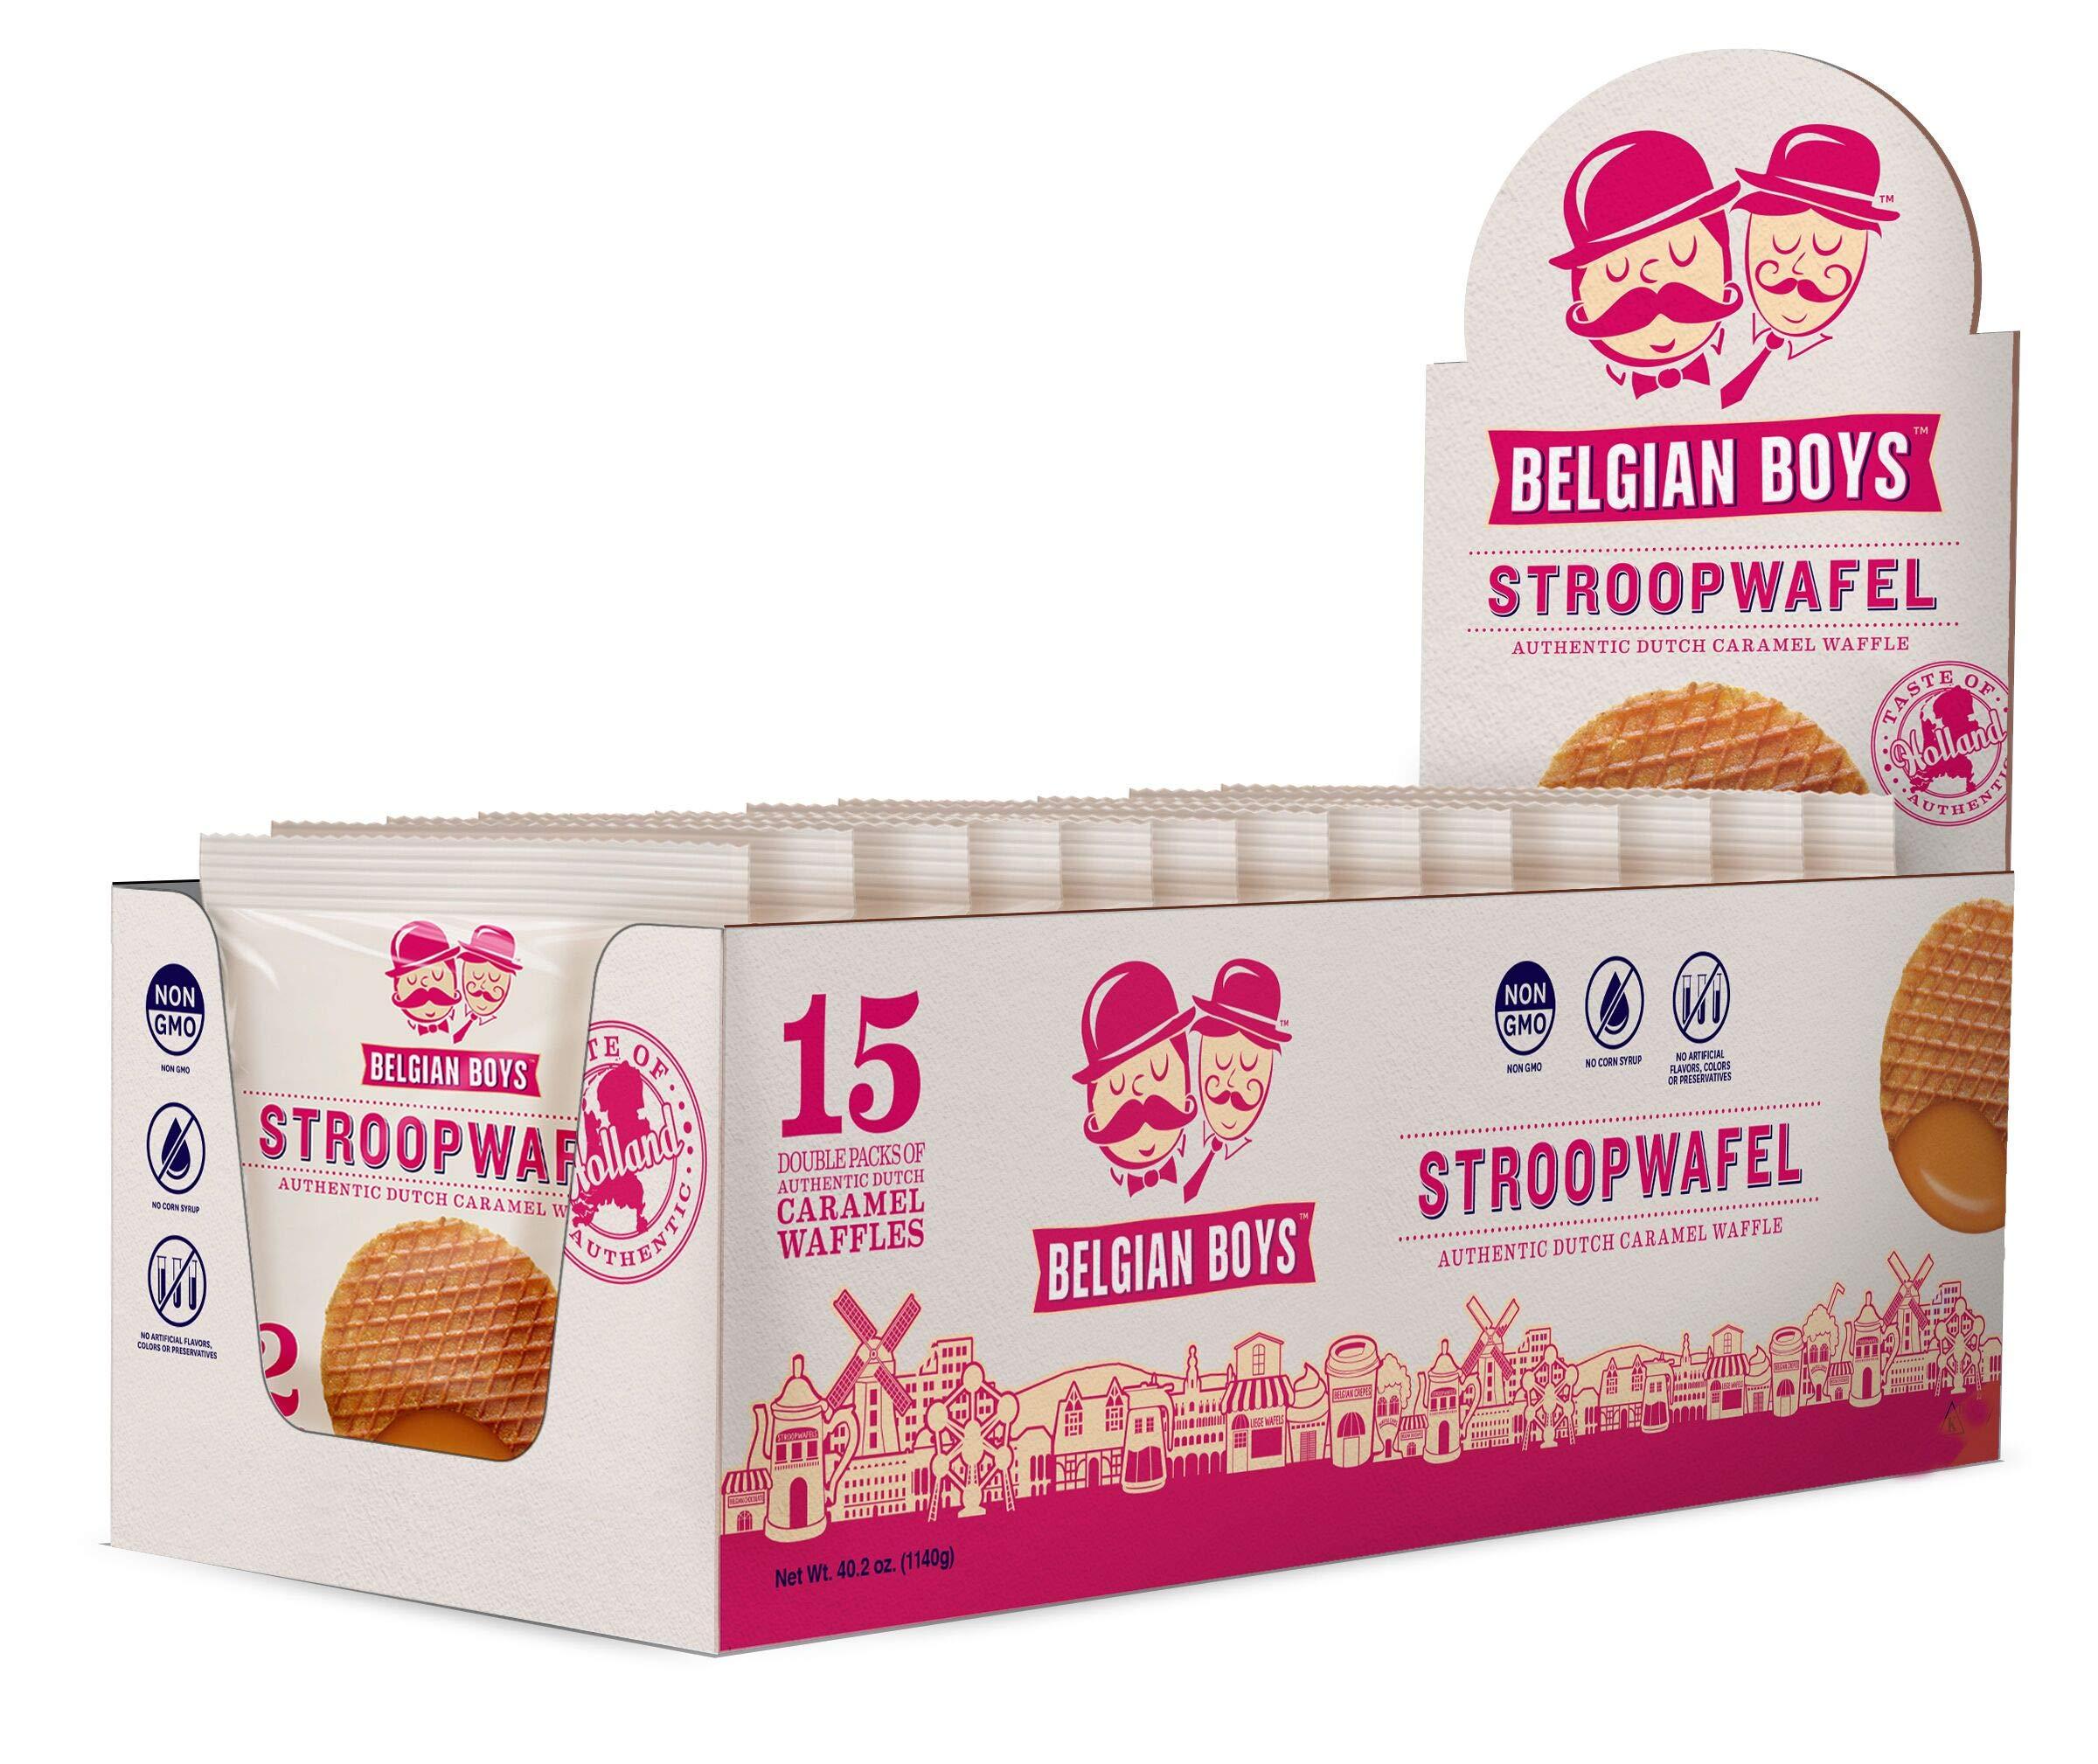 Belgian Boy Dutch Caramel Stroopwafel - 15pk (Each wrapped unit contains 2 Pieces- Total 30 Stroopwafels) - NonGMO, Kosher, No Corn Syrup by Belgian Boys